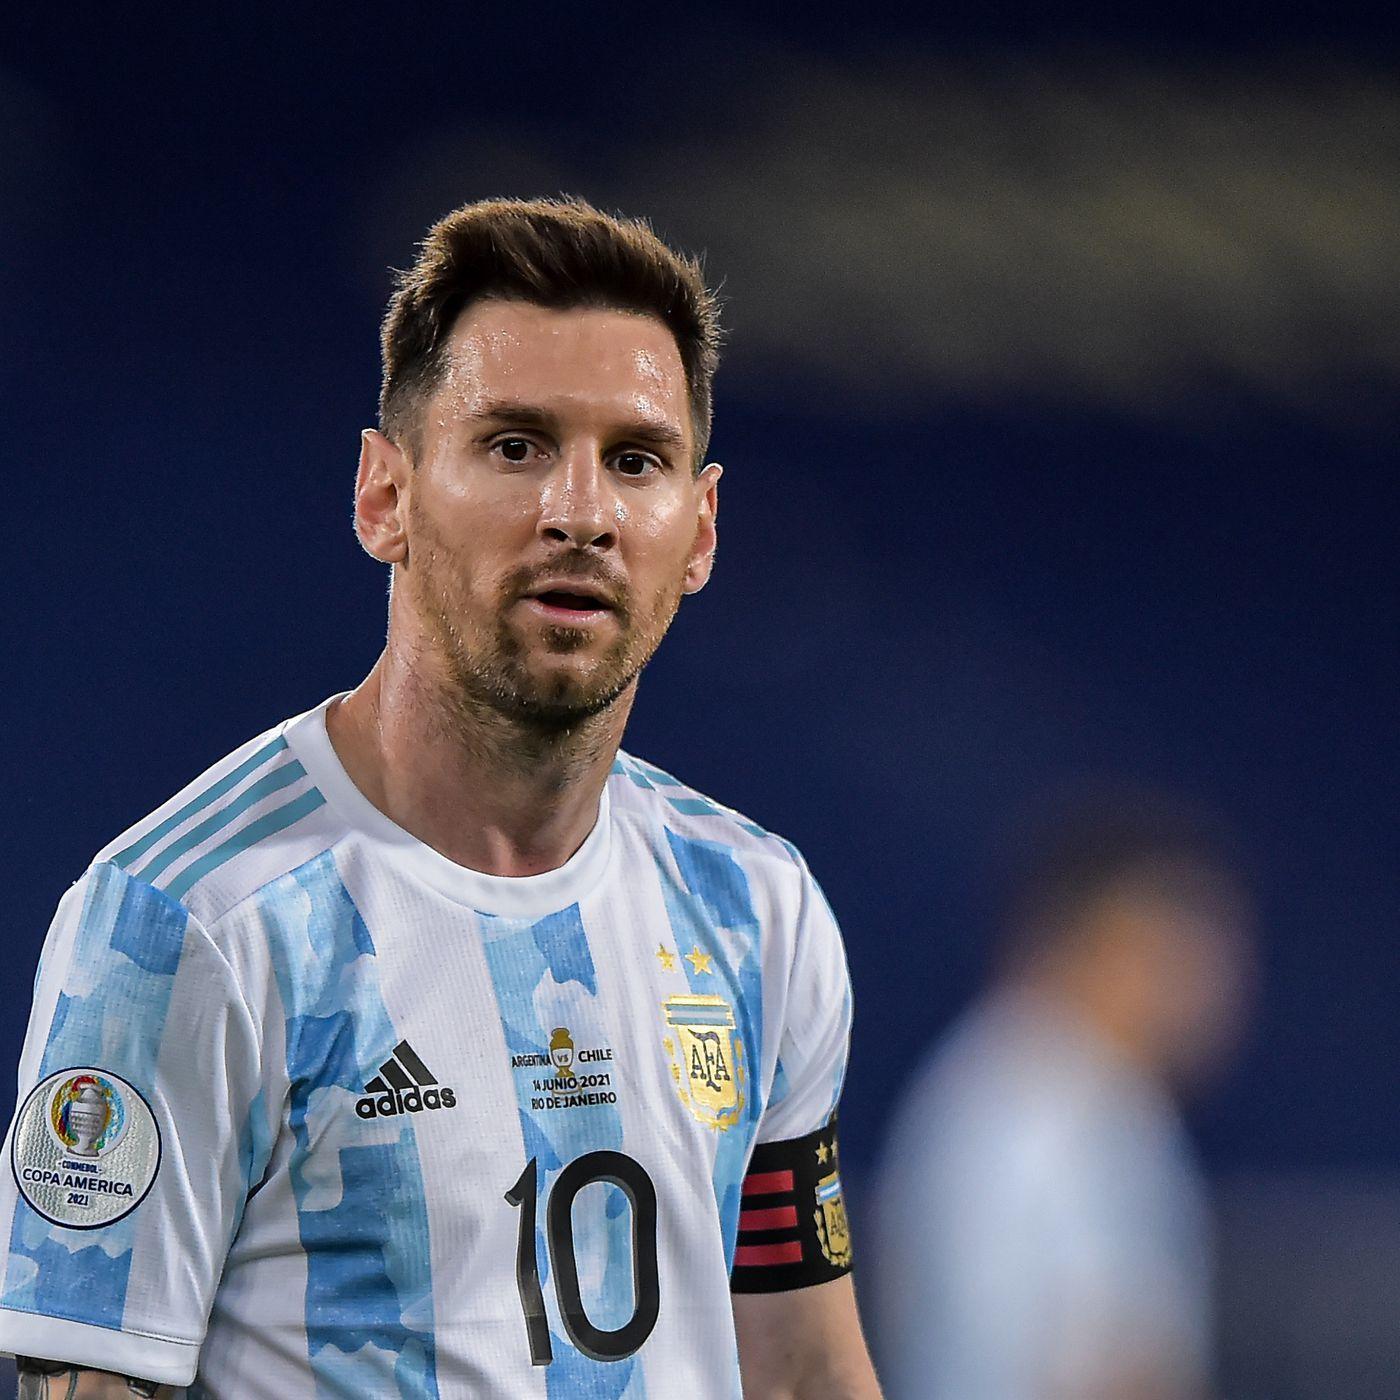 Argentina Vs Uruguay 2021 Time . Argentina Copa America Champions 2021 Wallpapers Wallpaper Cave